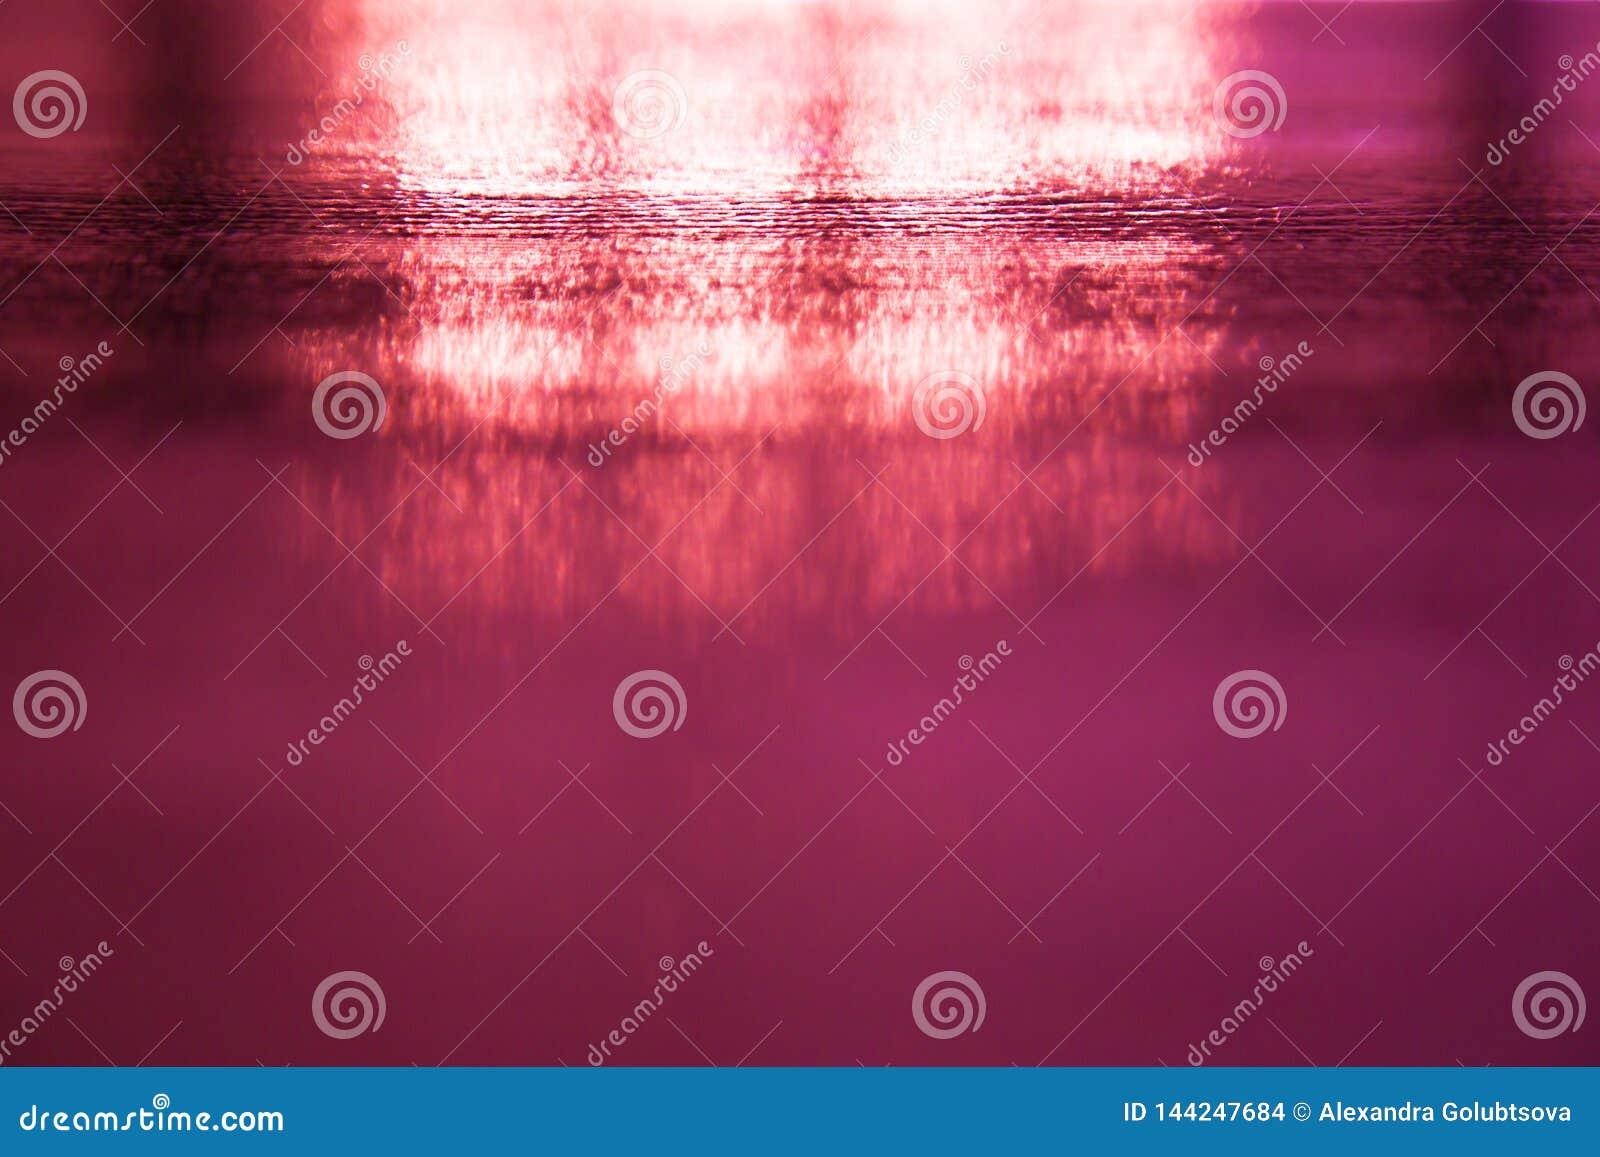 Pink blurred background.